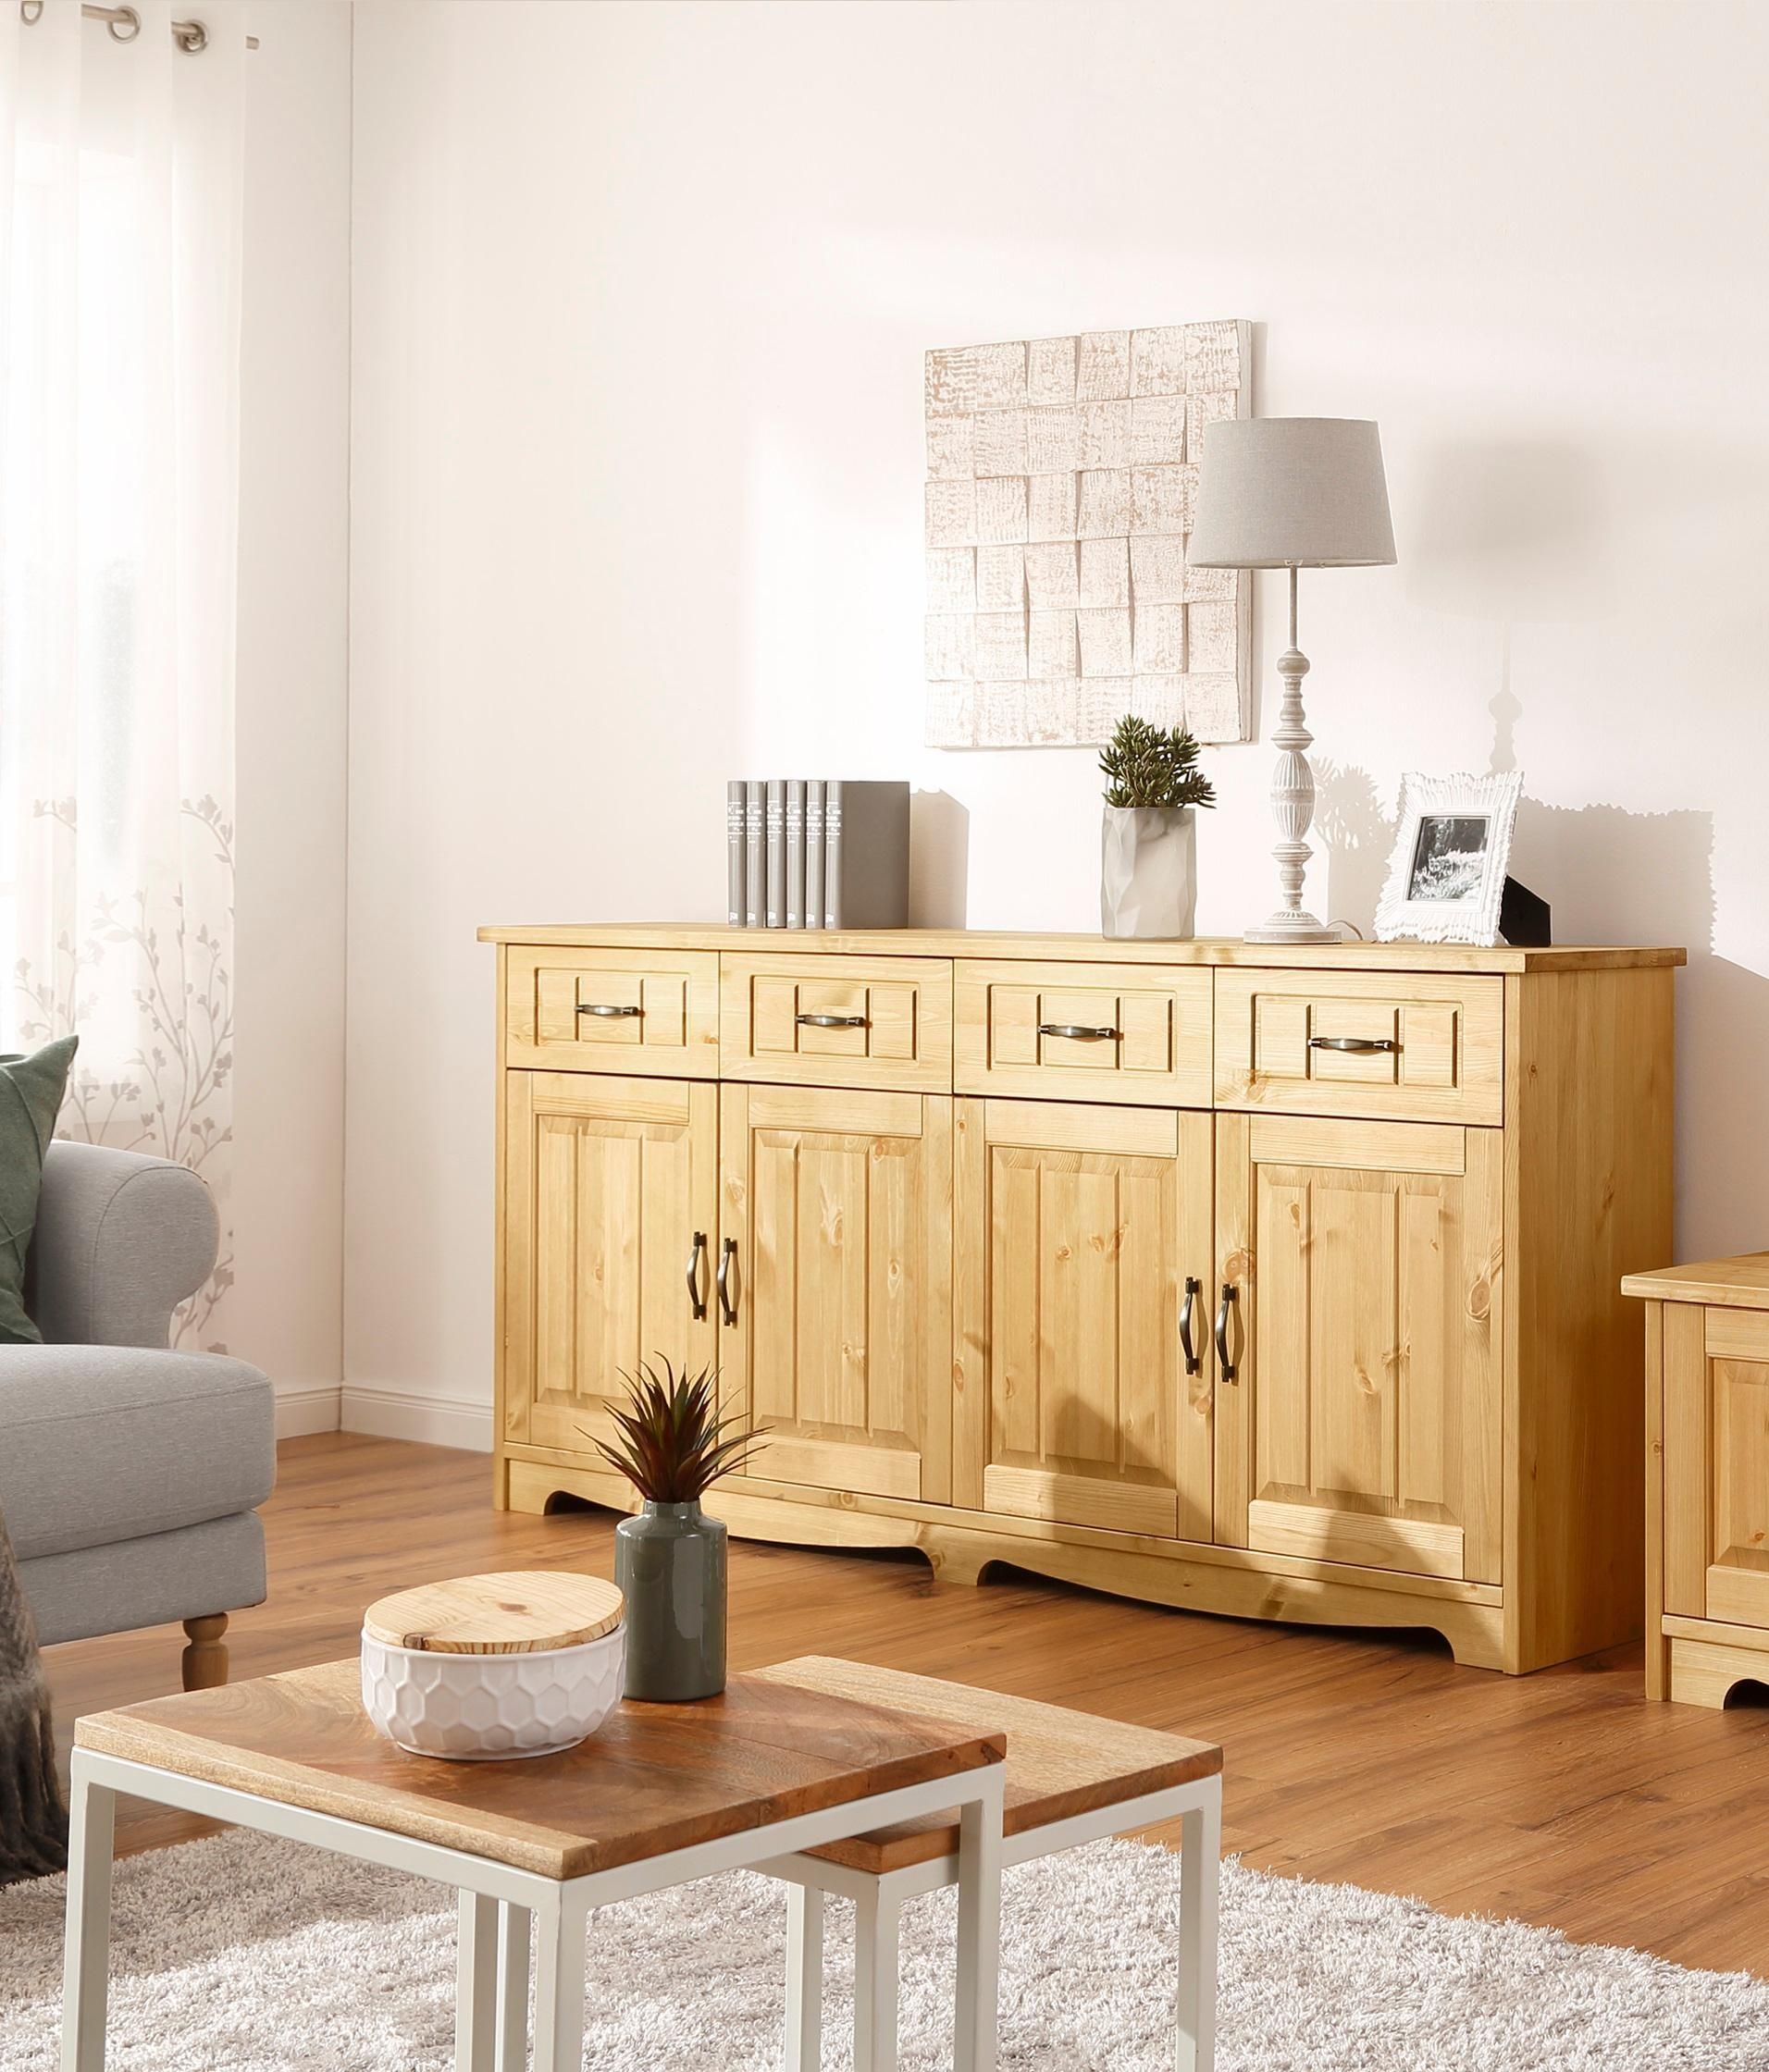 Home affaire Sideboard »Trinidad« Breite 194 cm